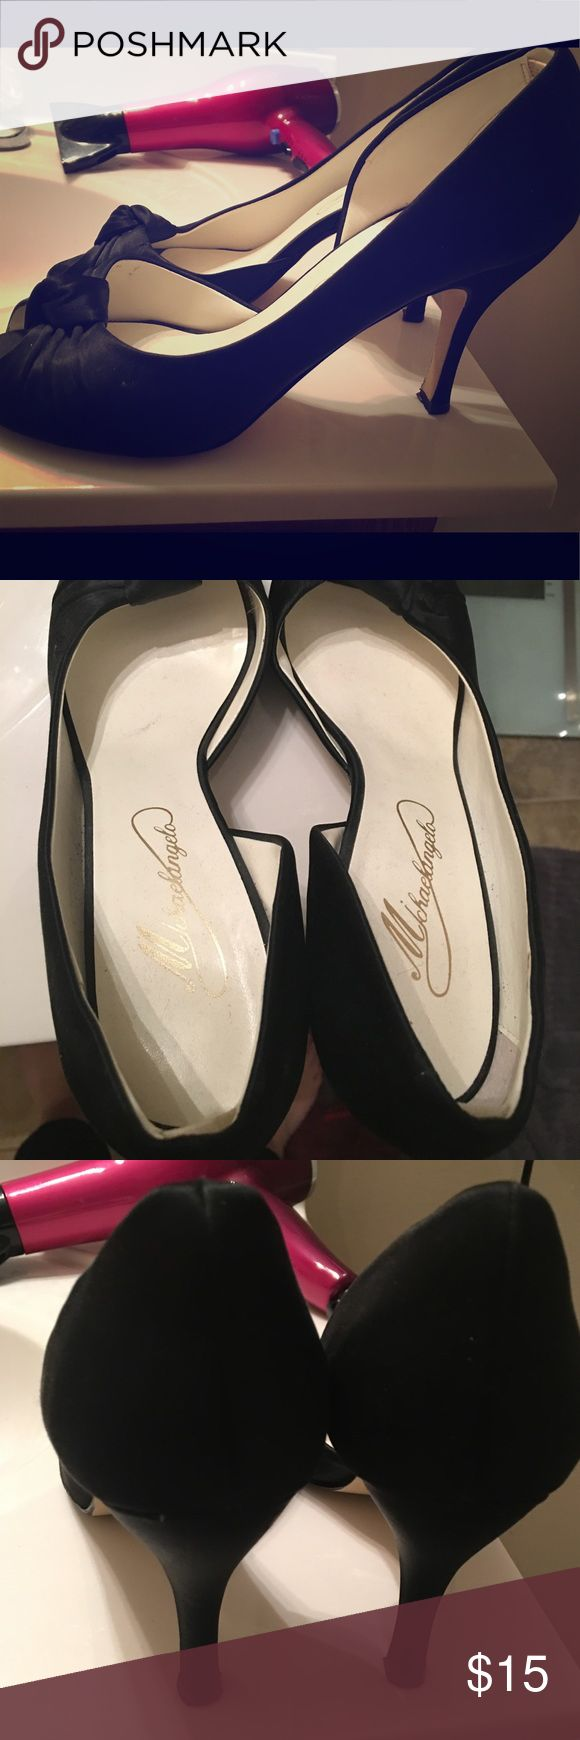 Elegant formal black satin pumps- Size 9.5 Purchased from Davids Bridal- worn only few times- dressy black shoe- size 9.5- smoke free home Shoes Heels